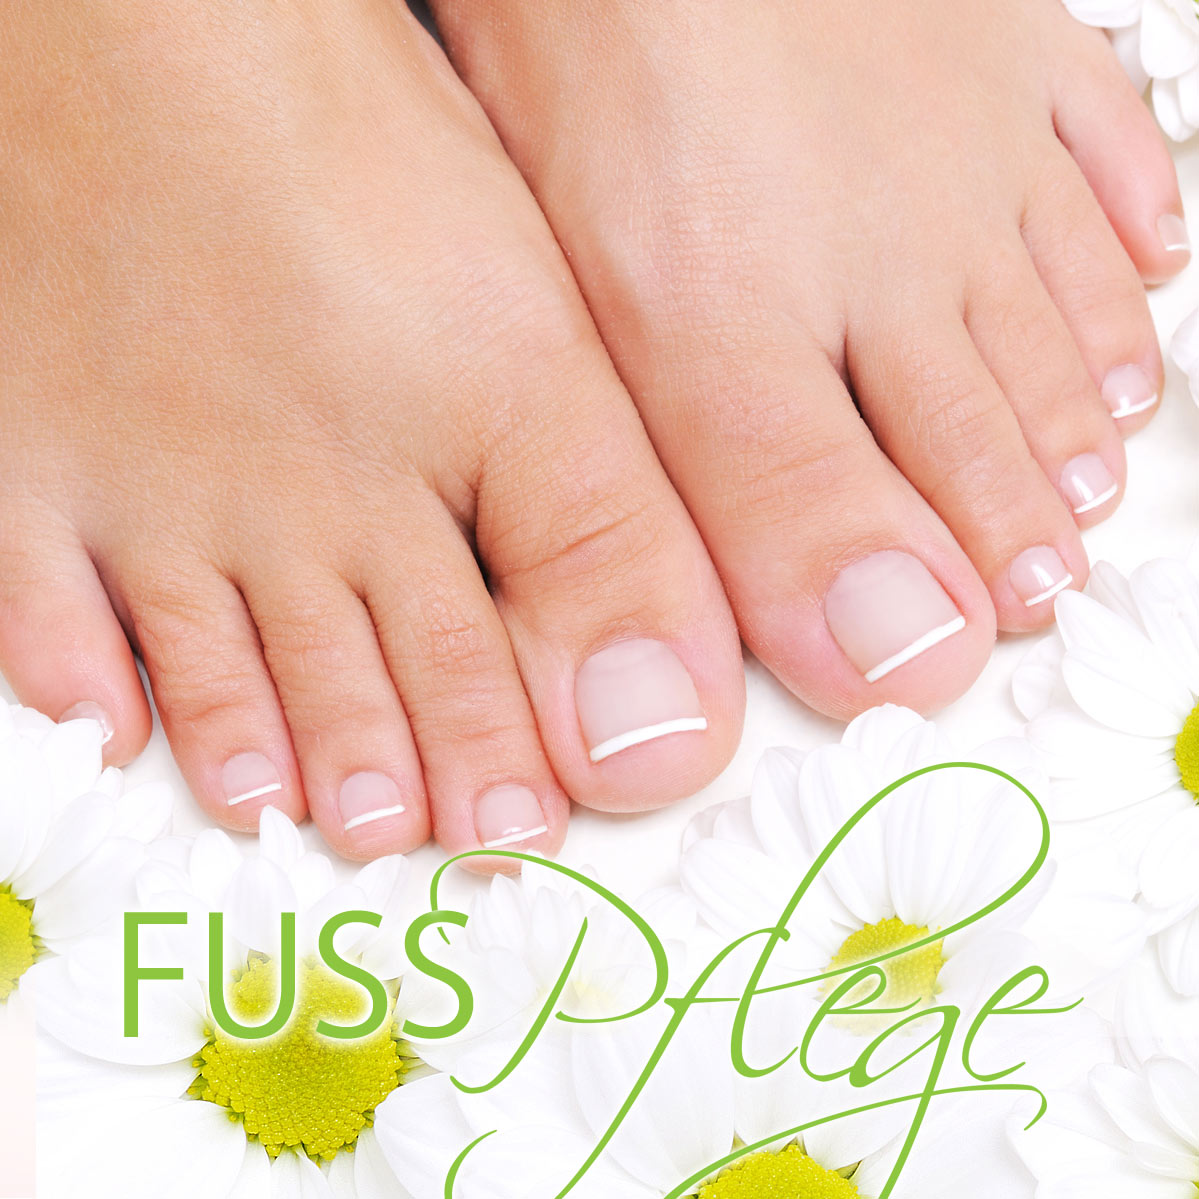 Fußpflege oder doch Pediküre?